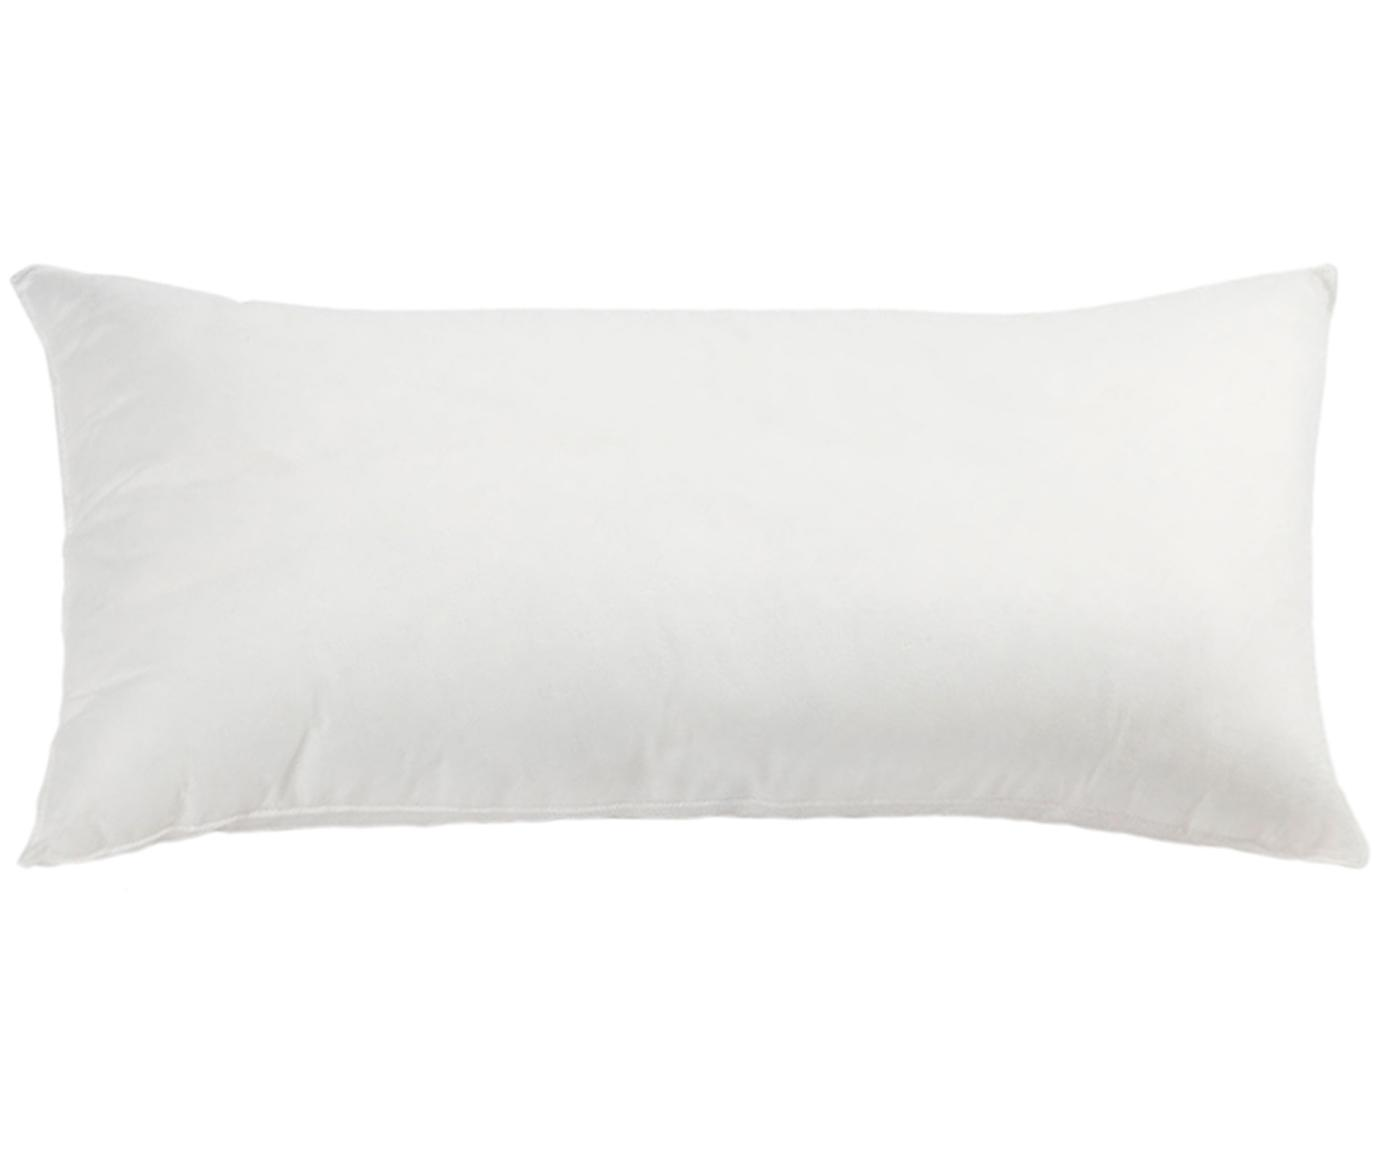 Imbottitura cuscino 30x60 Egret, Rivestimento: fibra sintetica, Bianco, Larg. 30 x Lung. 60 cm